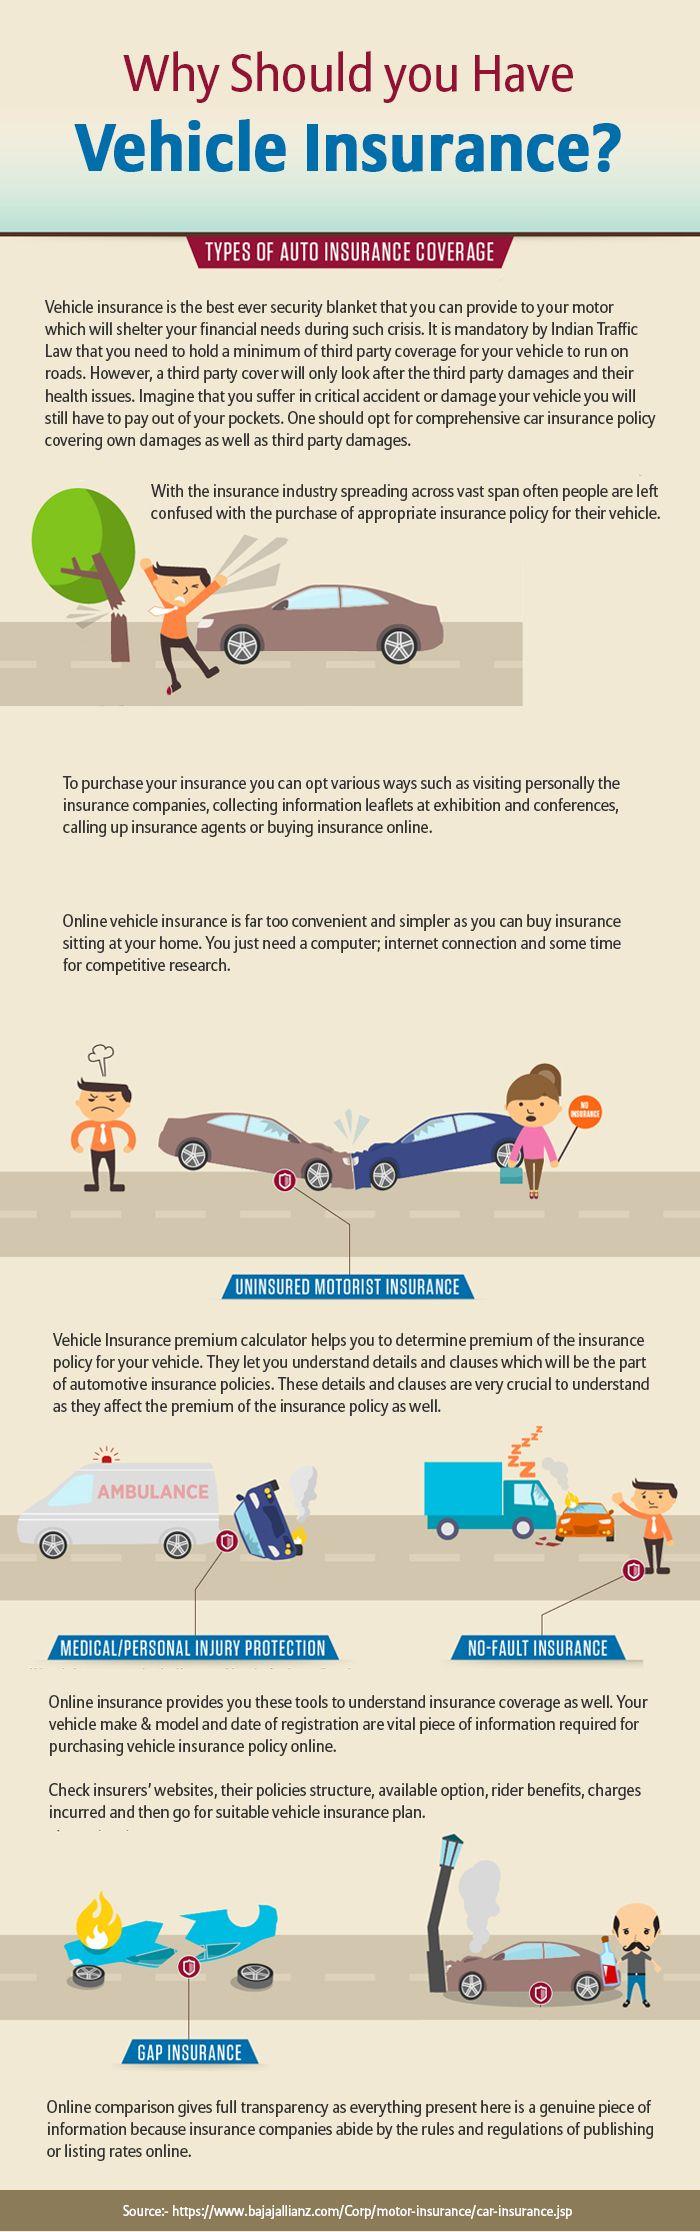 Best 25+ Buy car insurance ideas on Pinterest